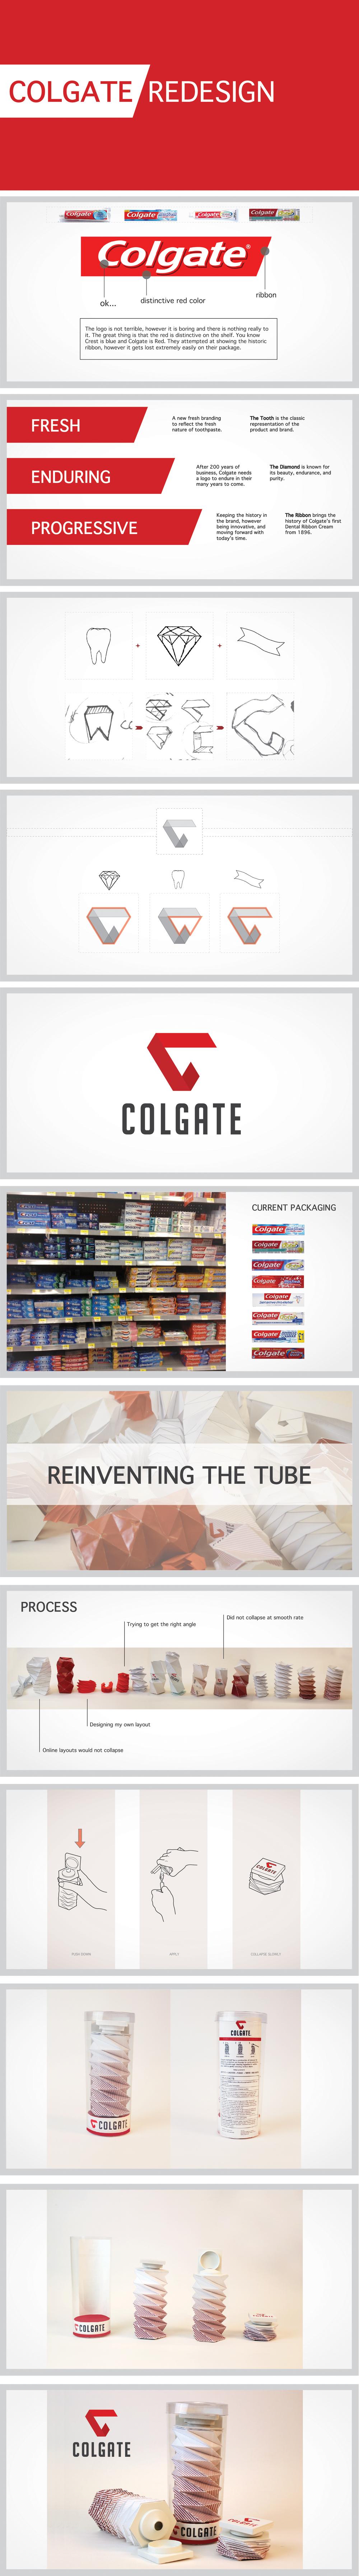 colgate-01.jpg